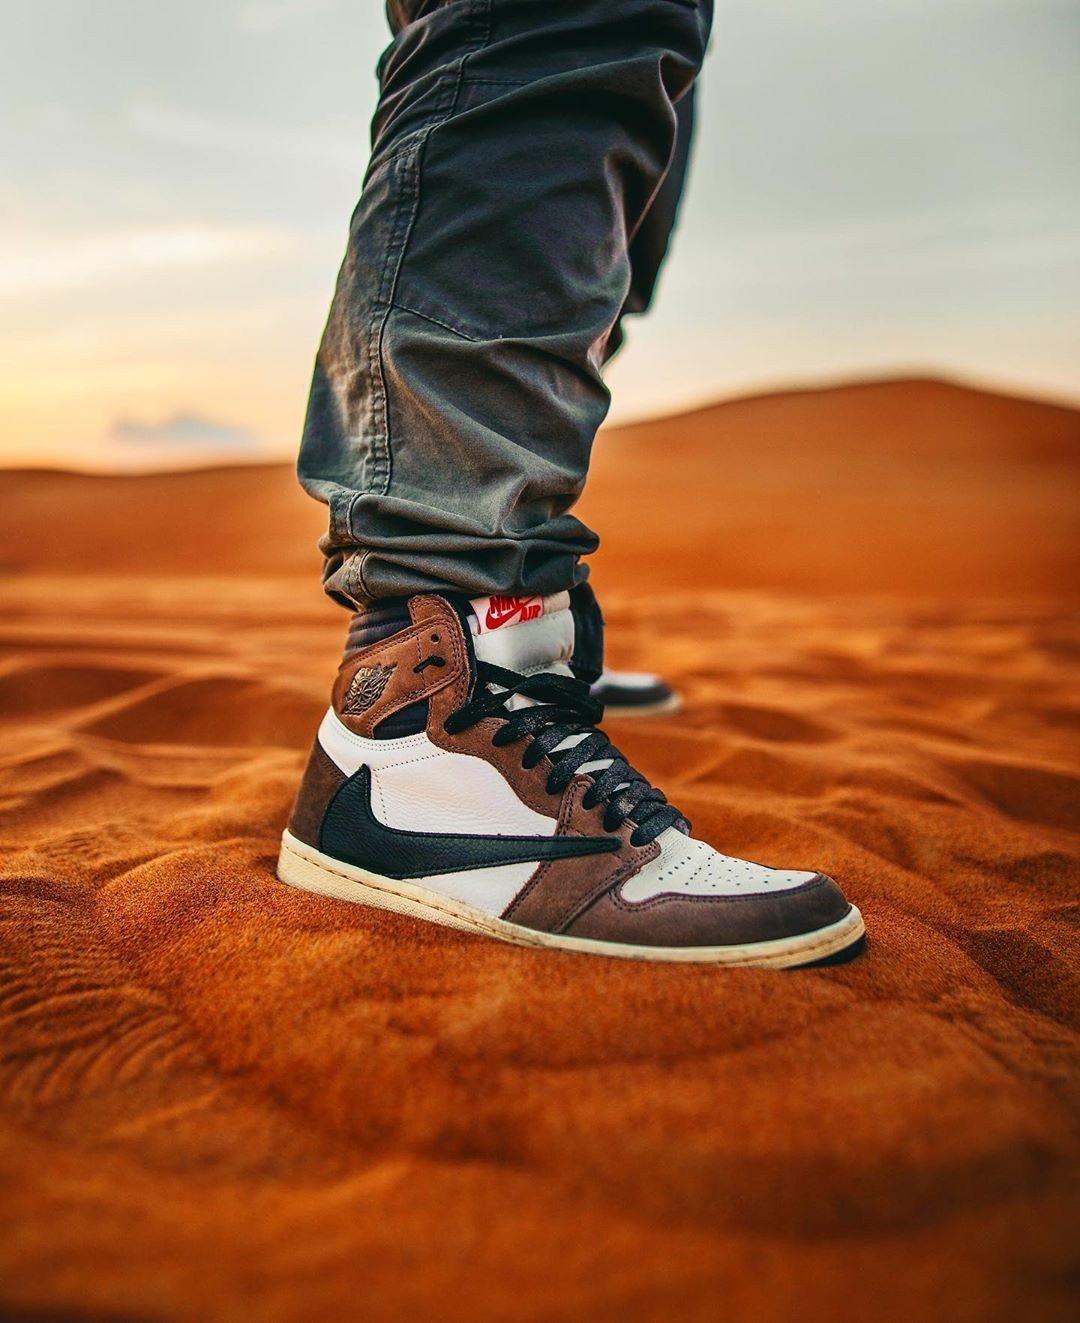 Travis Scott x Air Jordan 1 High